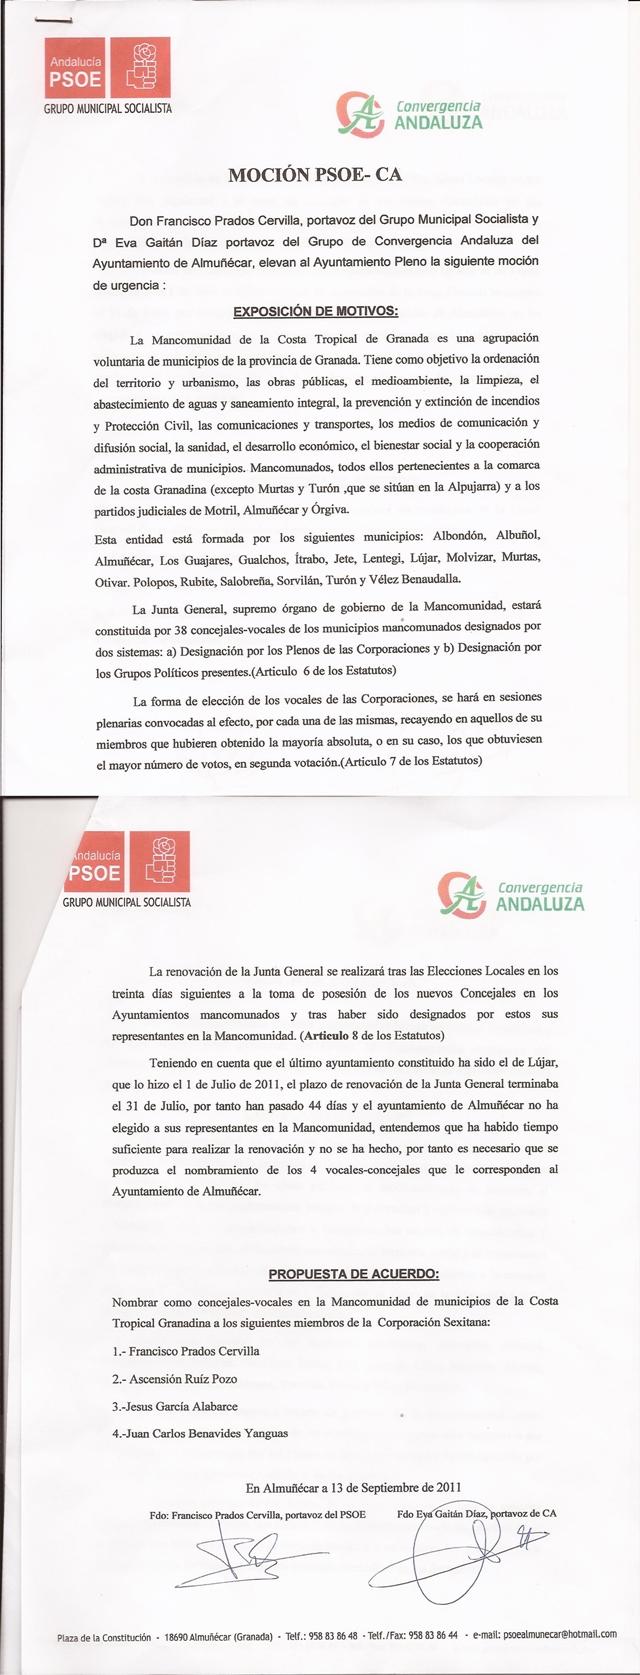 20110914161345-pacto-psoe-benavides-mancomunidad.jpg